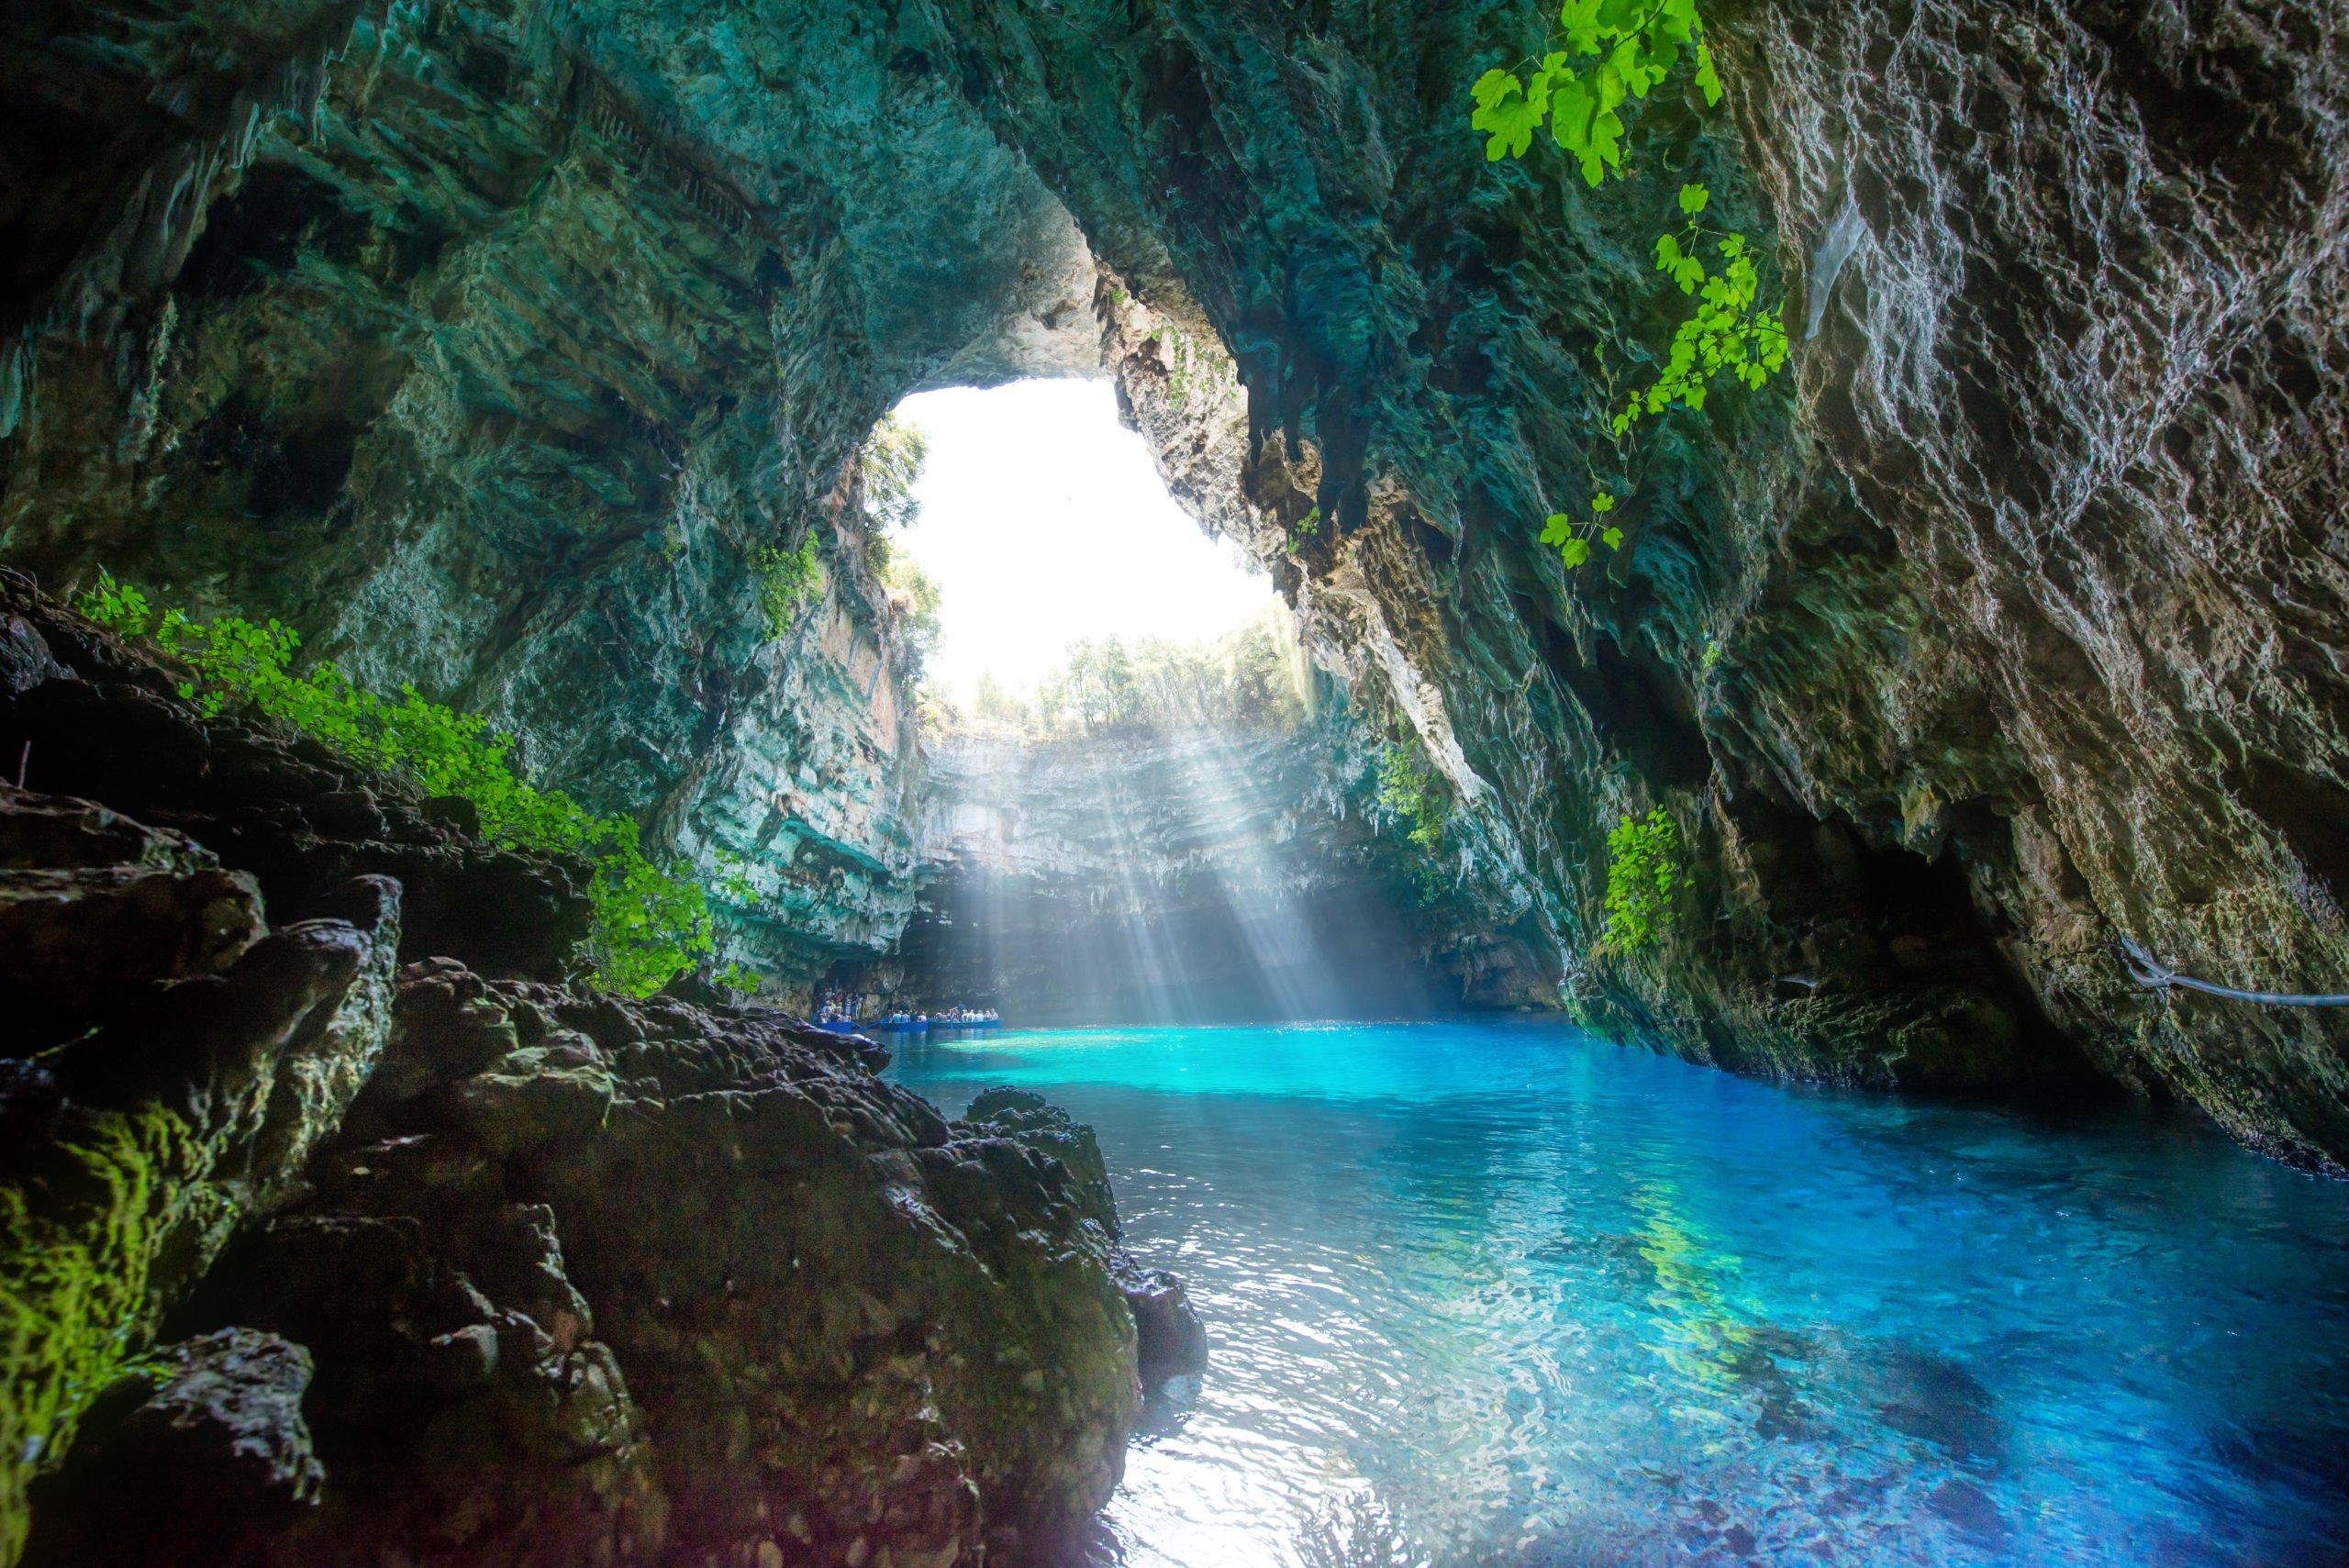 Don't Miss The Chance To Visit The Famous Melissani Lake Kefalonia Coastline Cruise Including Fiscardo & Melissani Lake